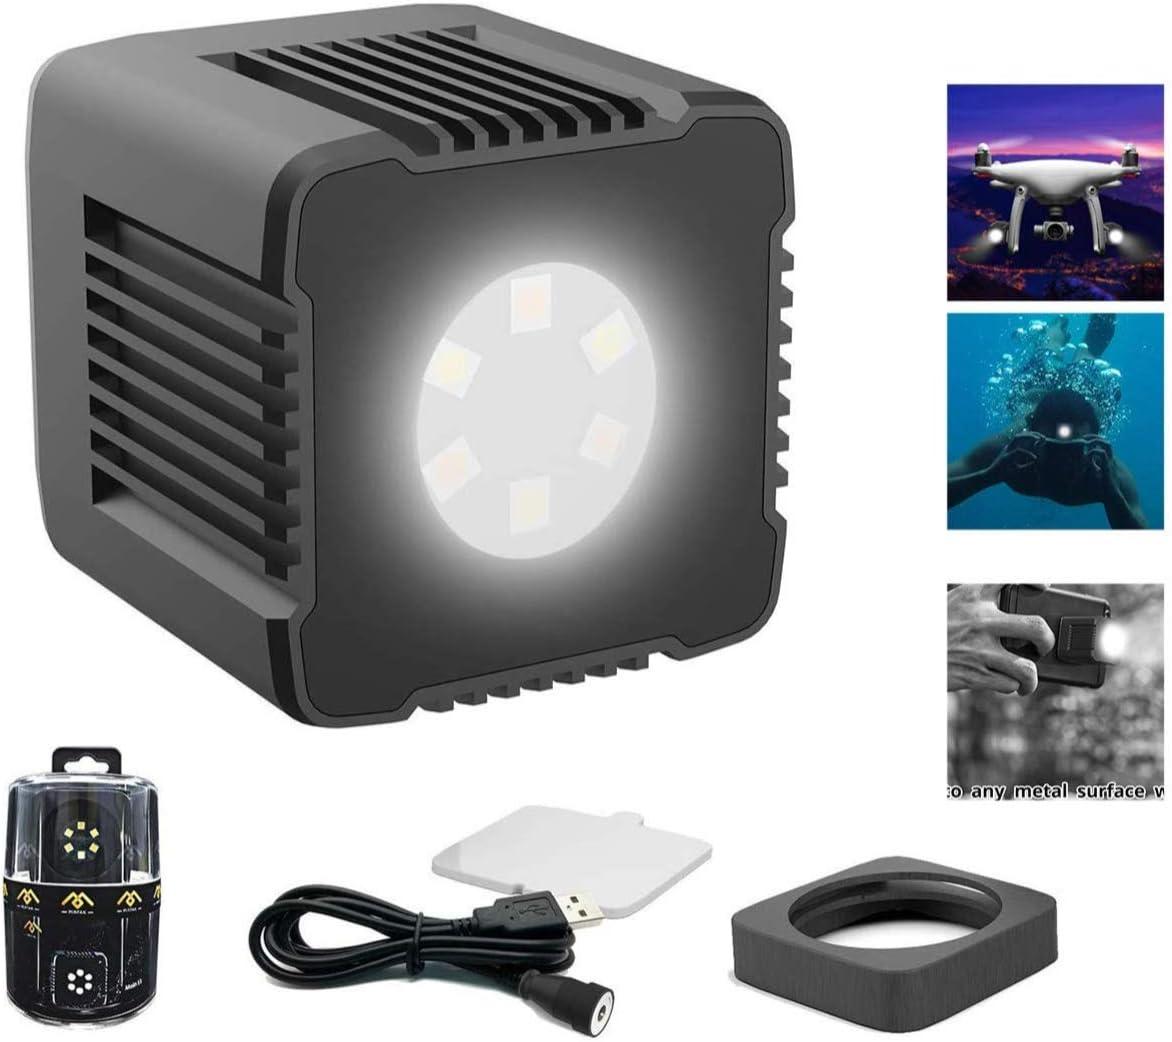 Mirfak Moin Light Mini Led Licht Wasserdicht Tragbar Kamera